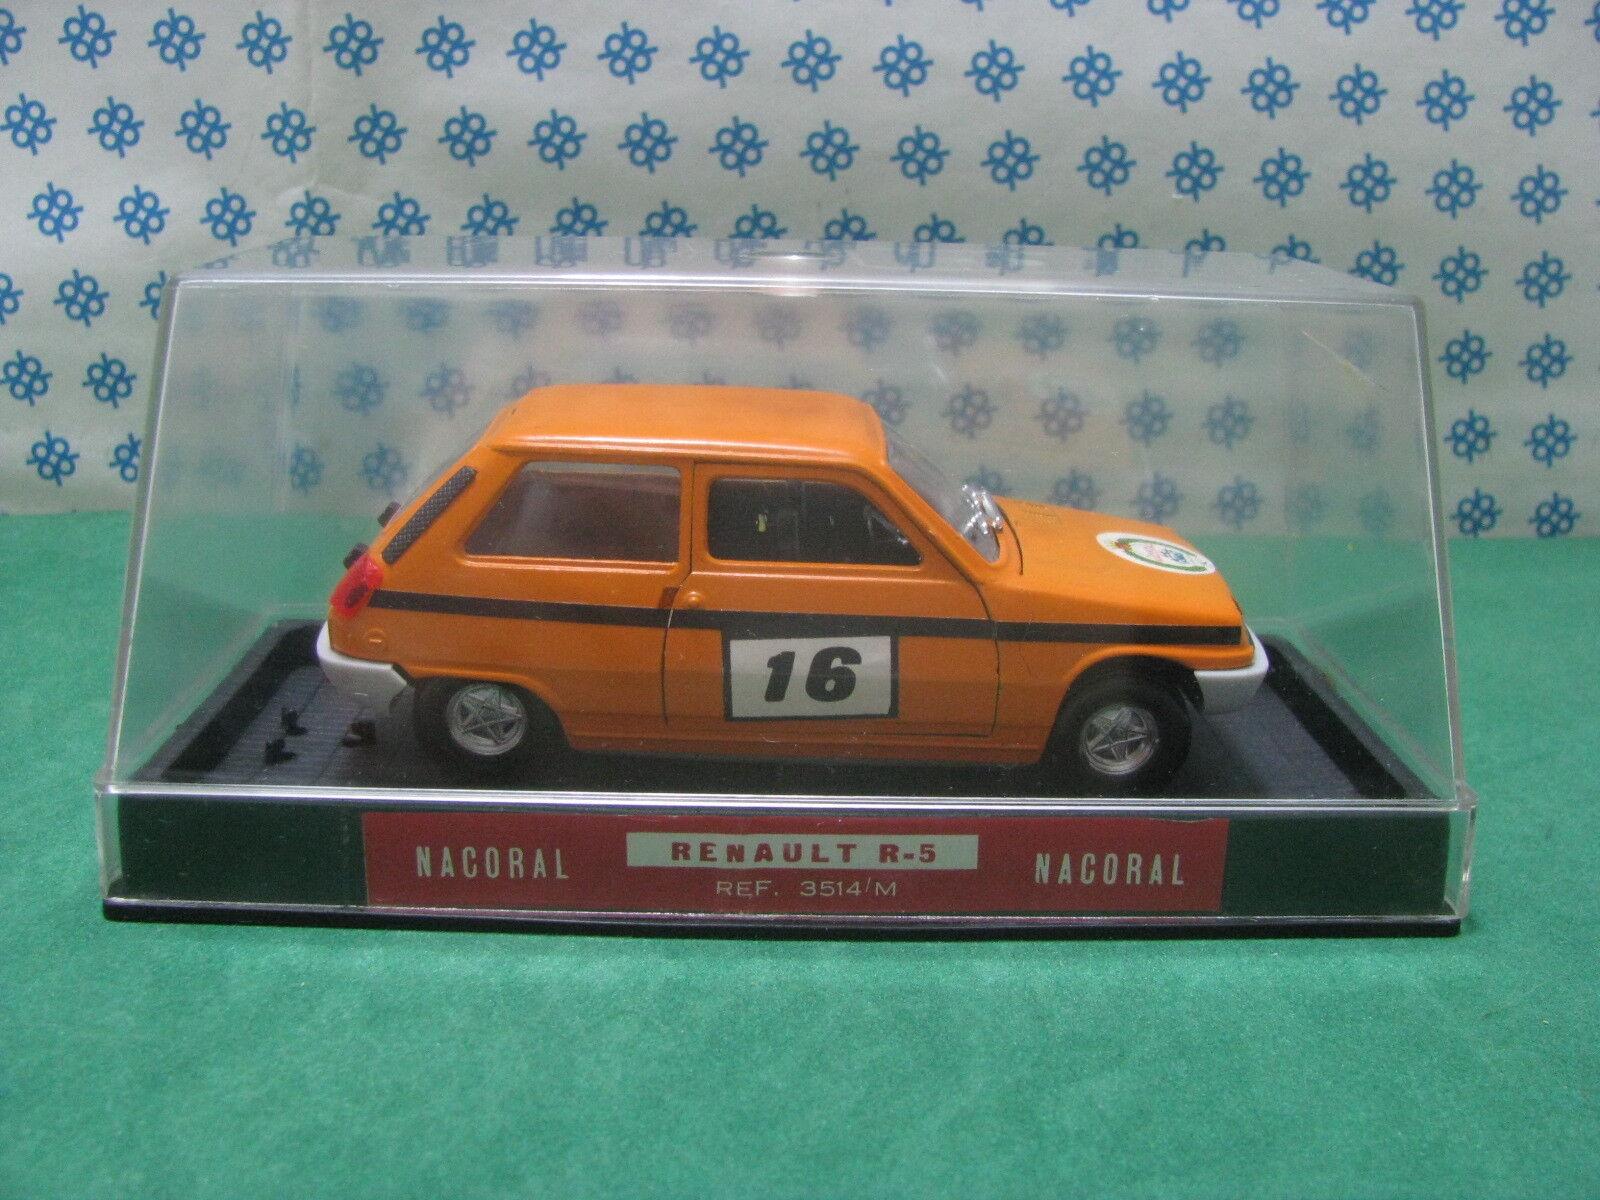 Vintage-Renault 5 tl Rally - 1 25 Nacoral pág. a.ref.3514 M